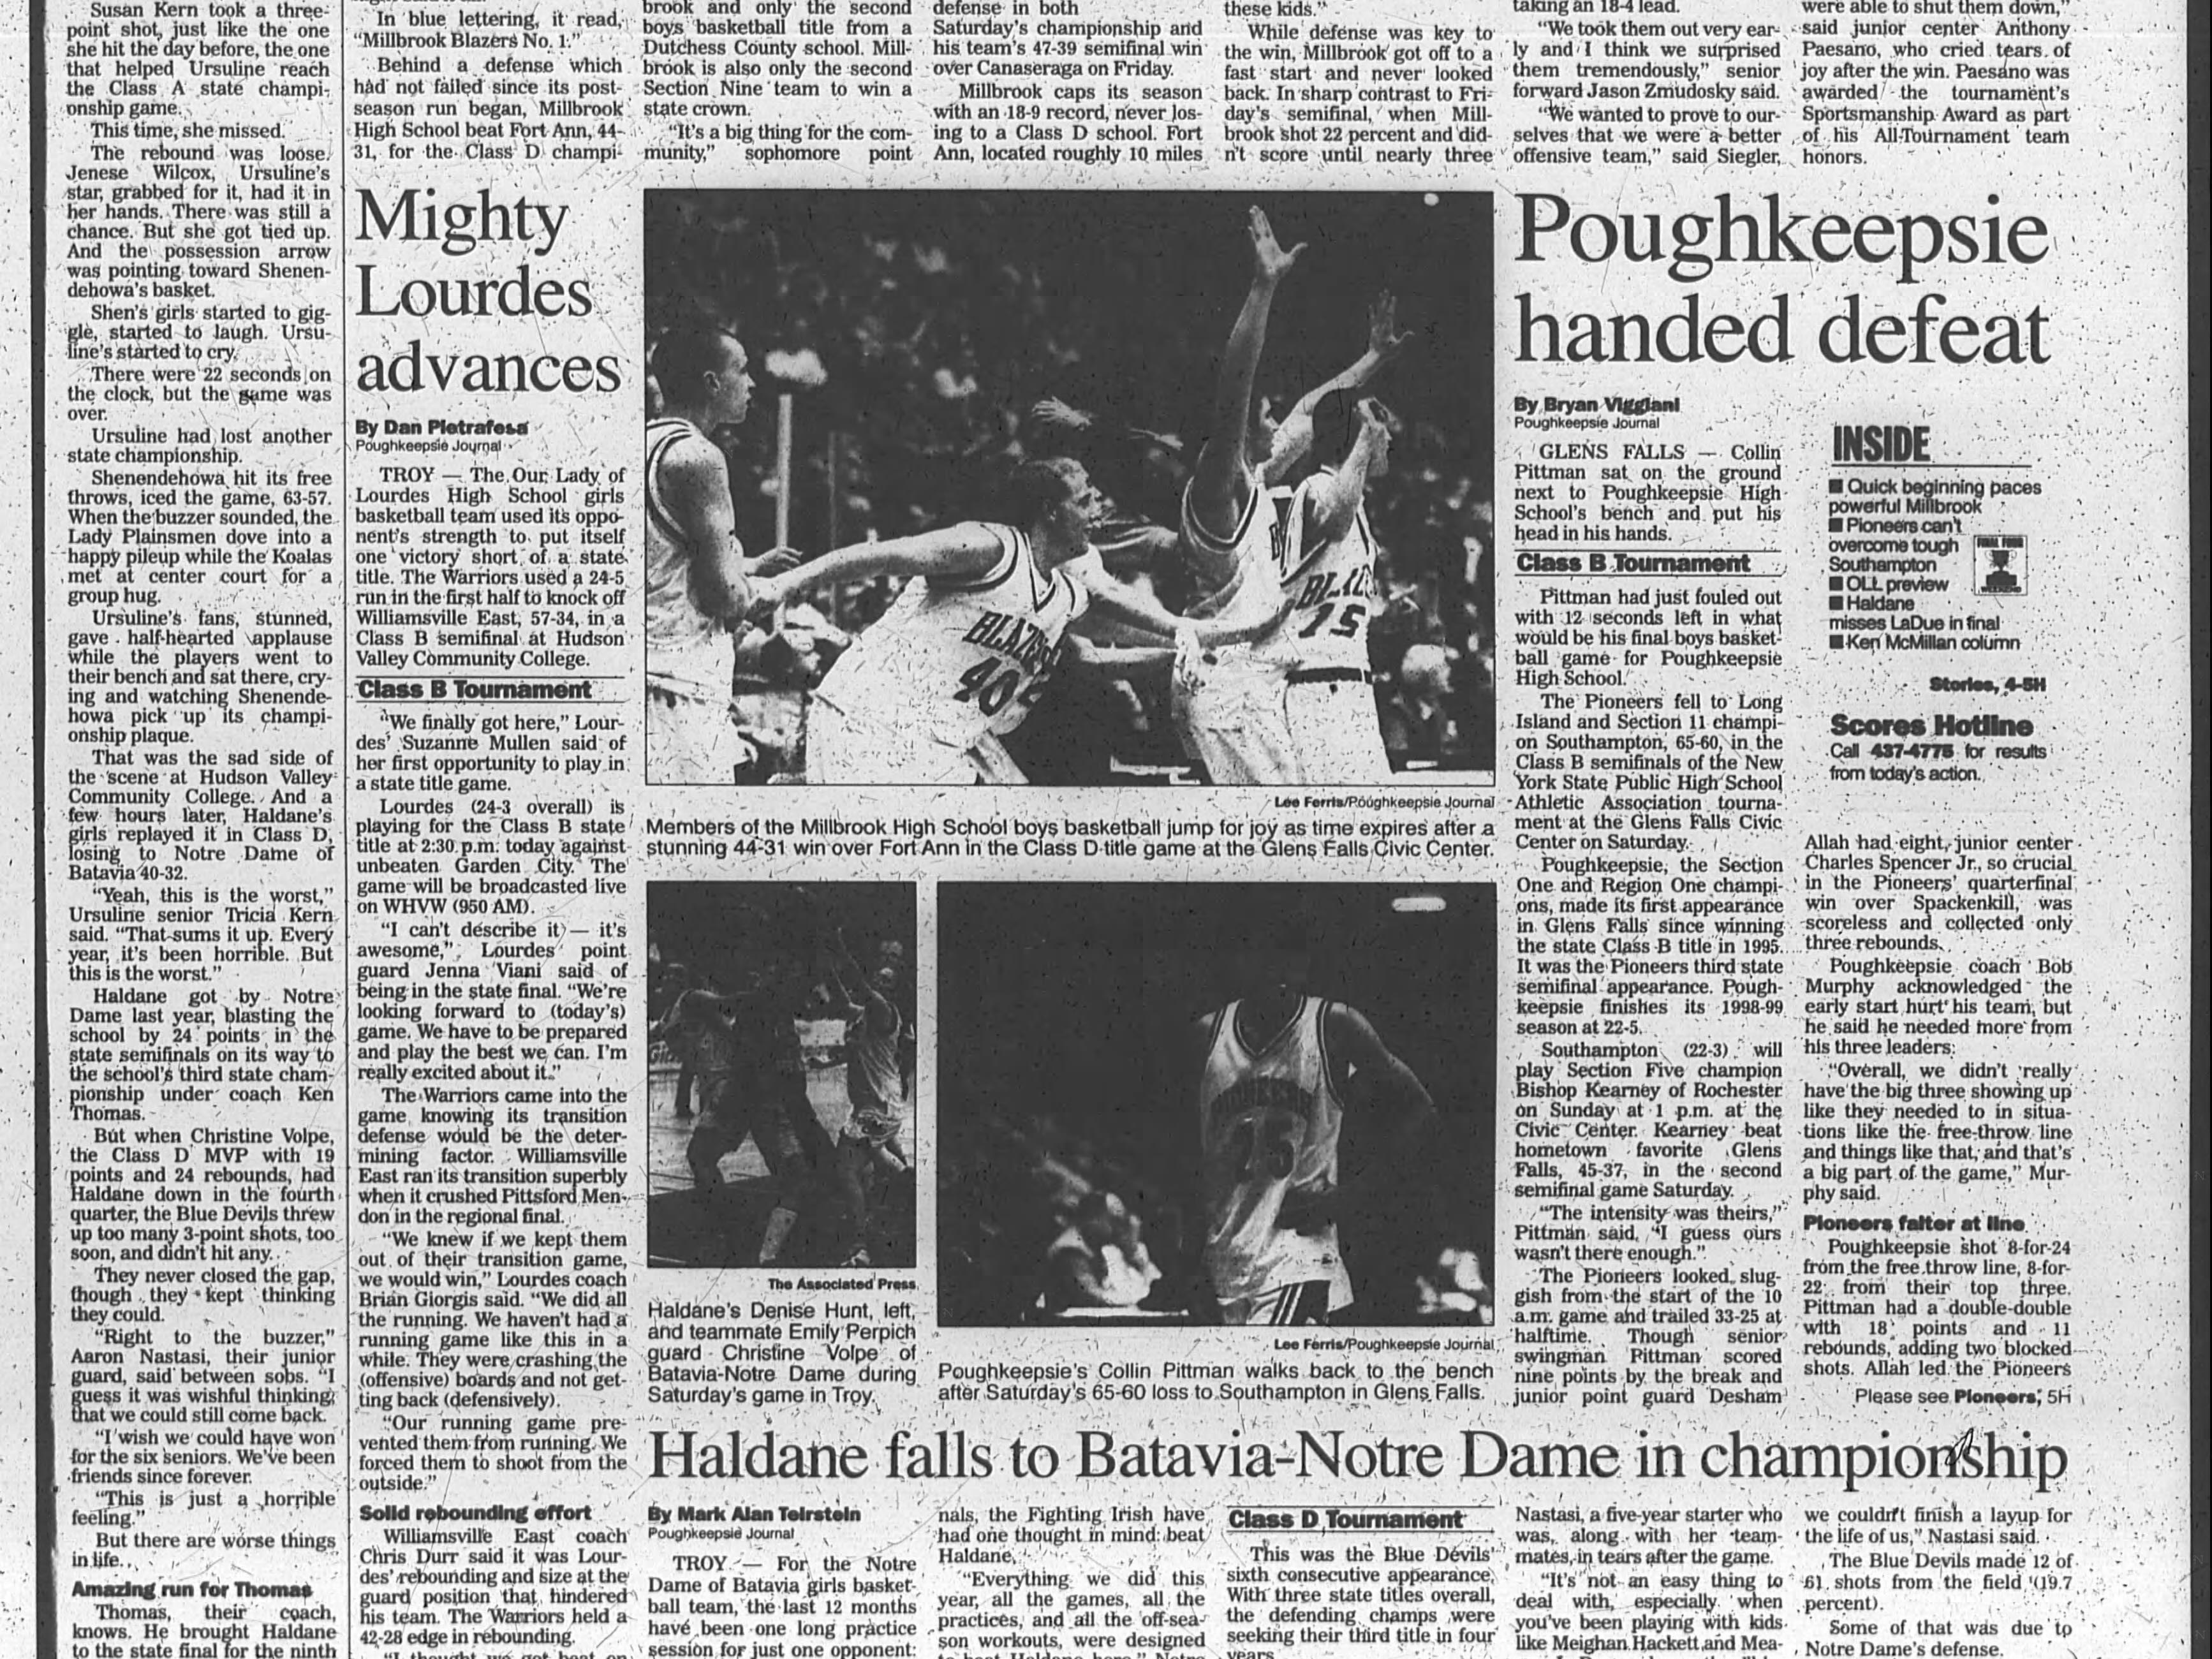 Journal clip highlighting Millbrook's New York State Class D championship.